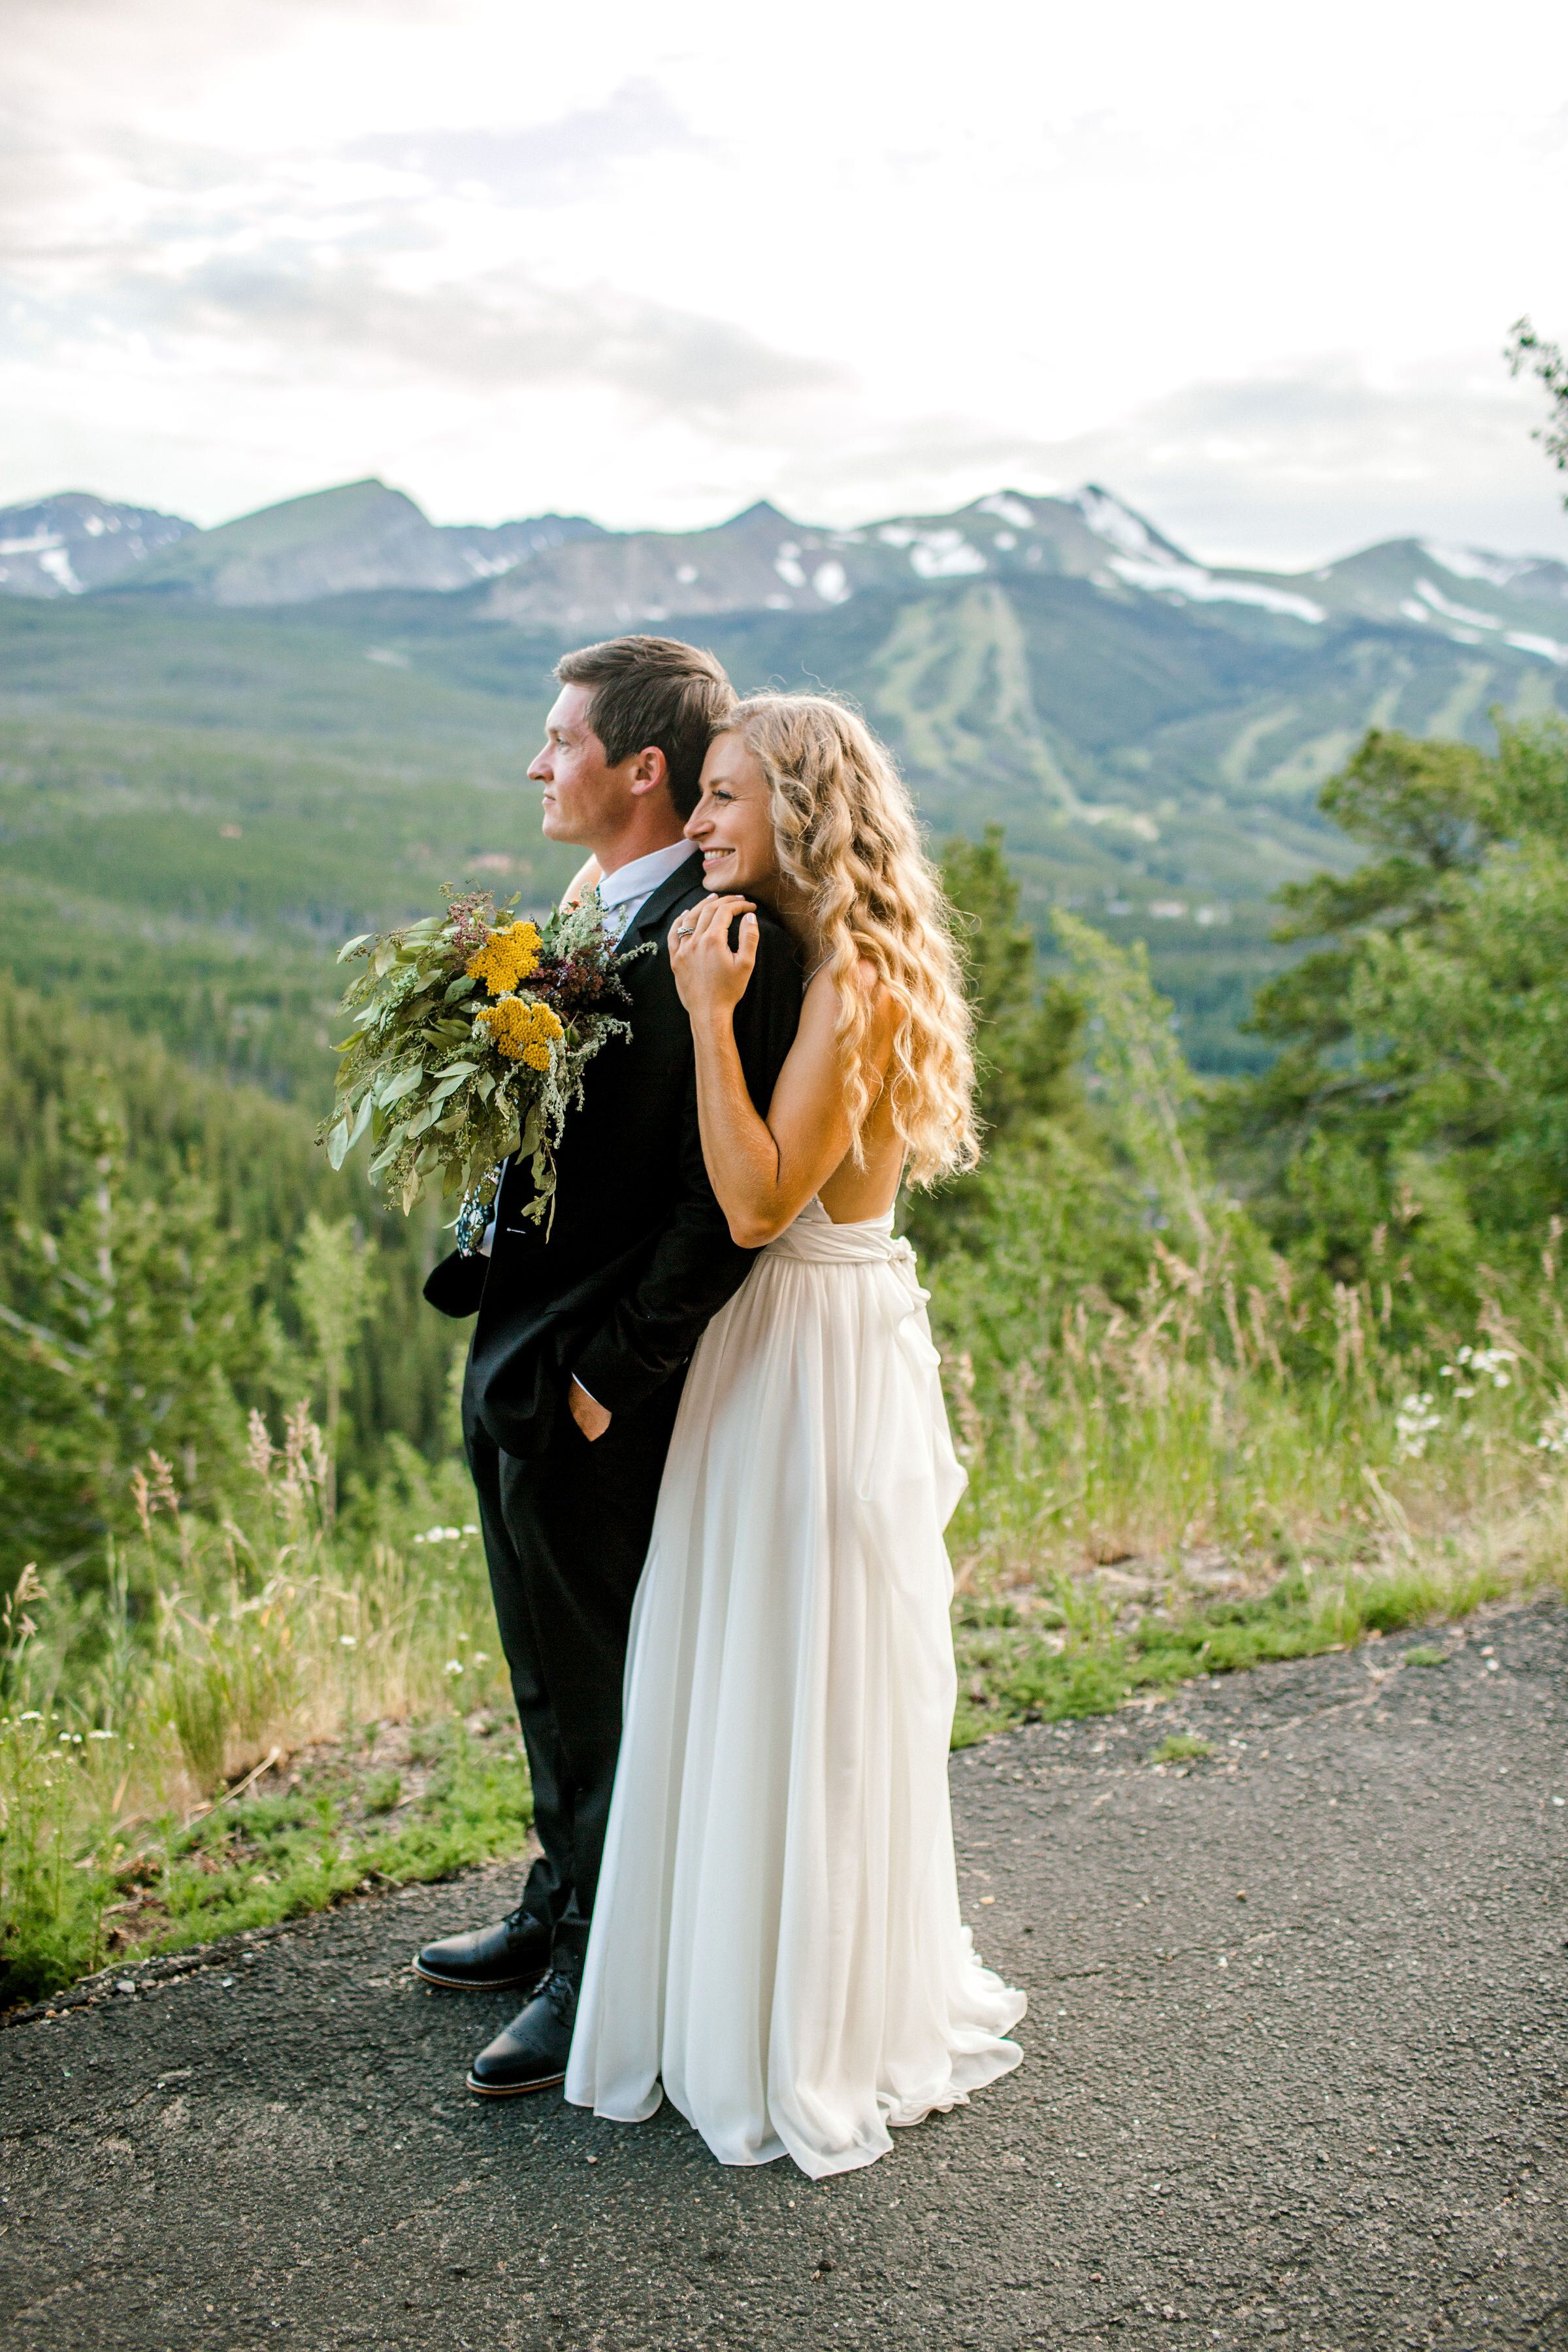 Matt + Joan; A Breckenridge Wedding Breckenridge wedding